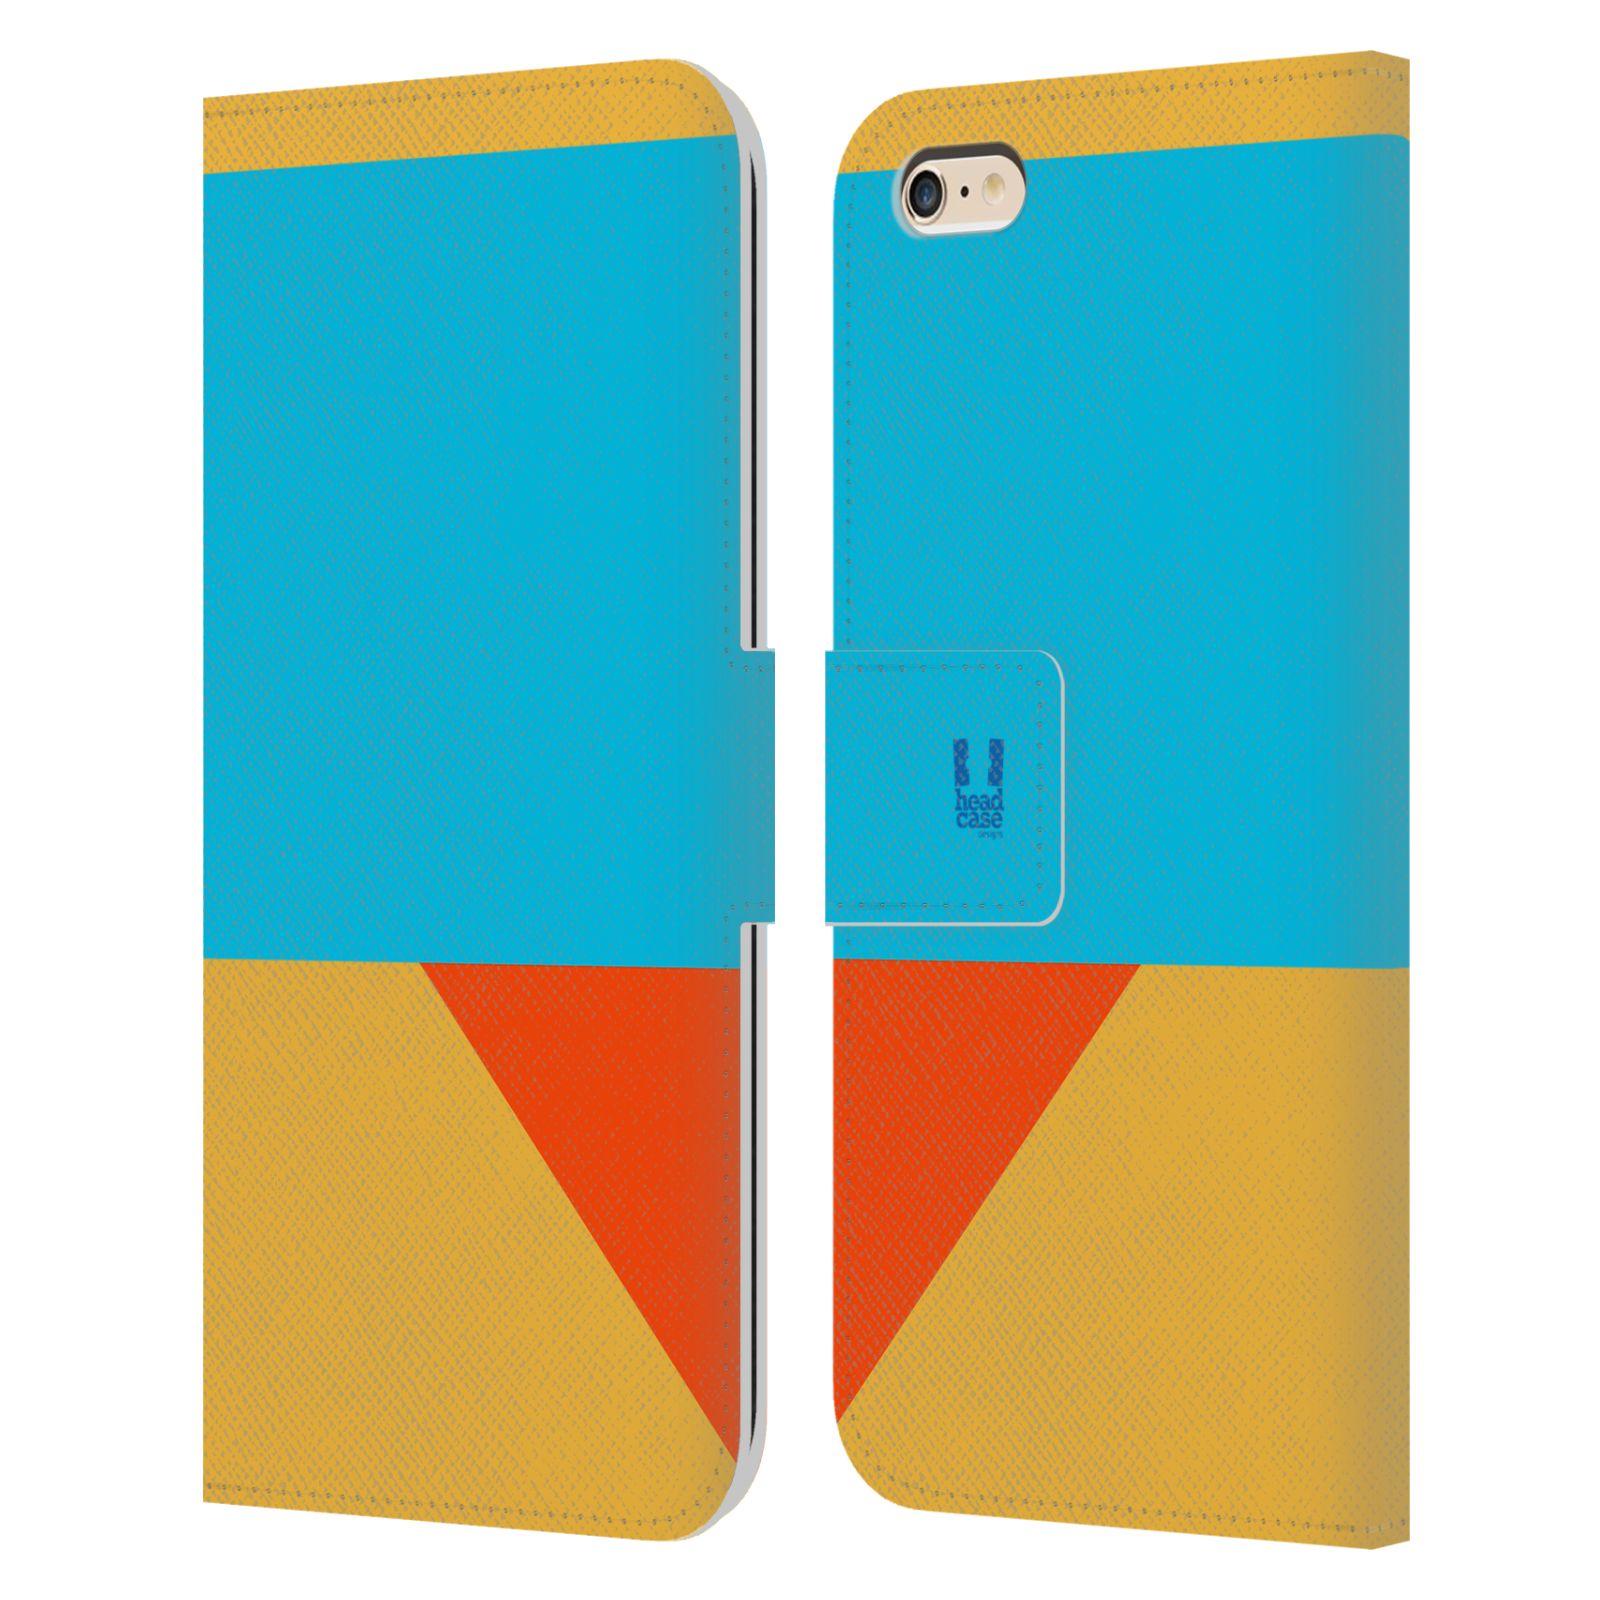 HEAD CASE Flipové pouzdro pro mobil Apple Iphone 6 PLUS/6S PLUS barevné tvary béžová a modrá DAY WEAR